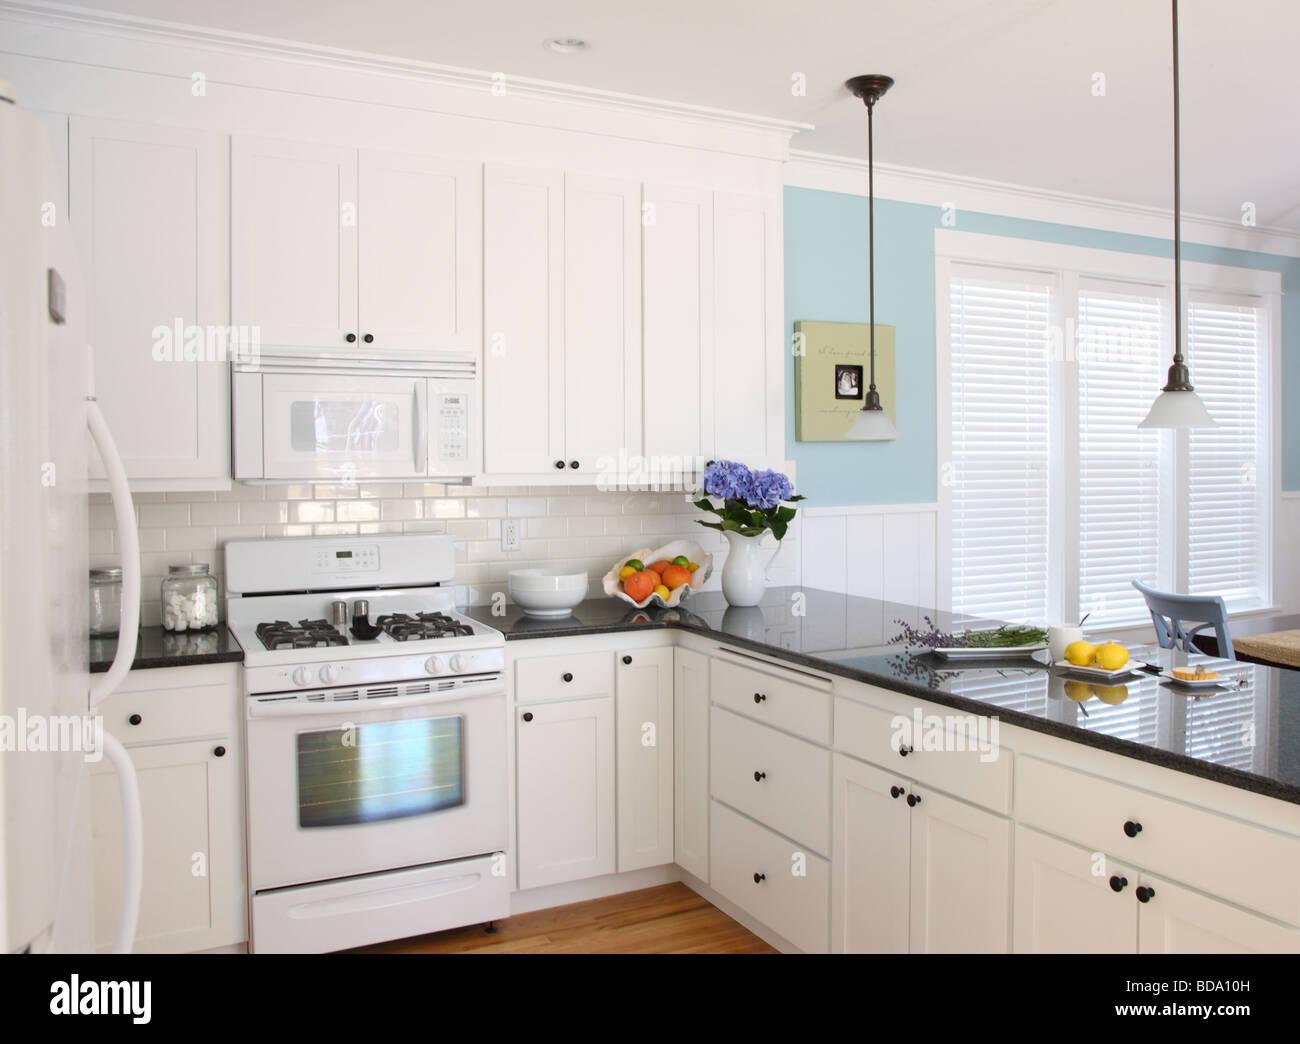 Beach house kitchen interior - Stock Image